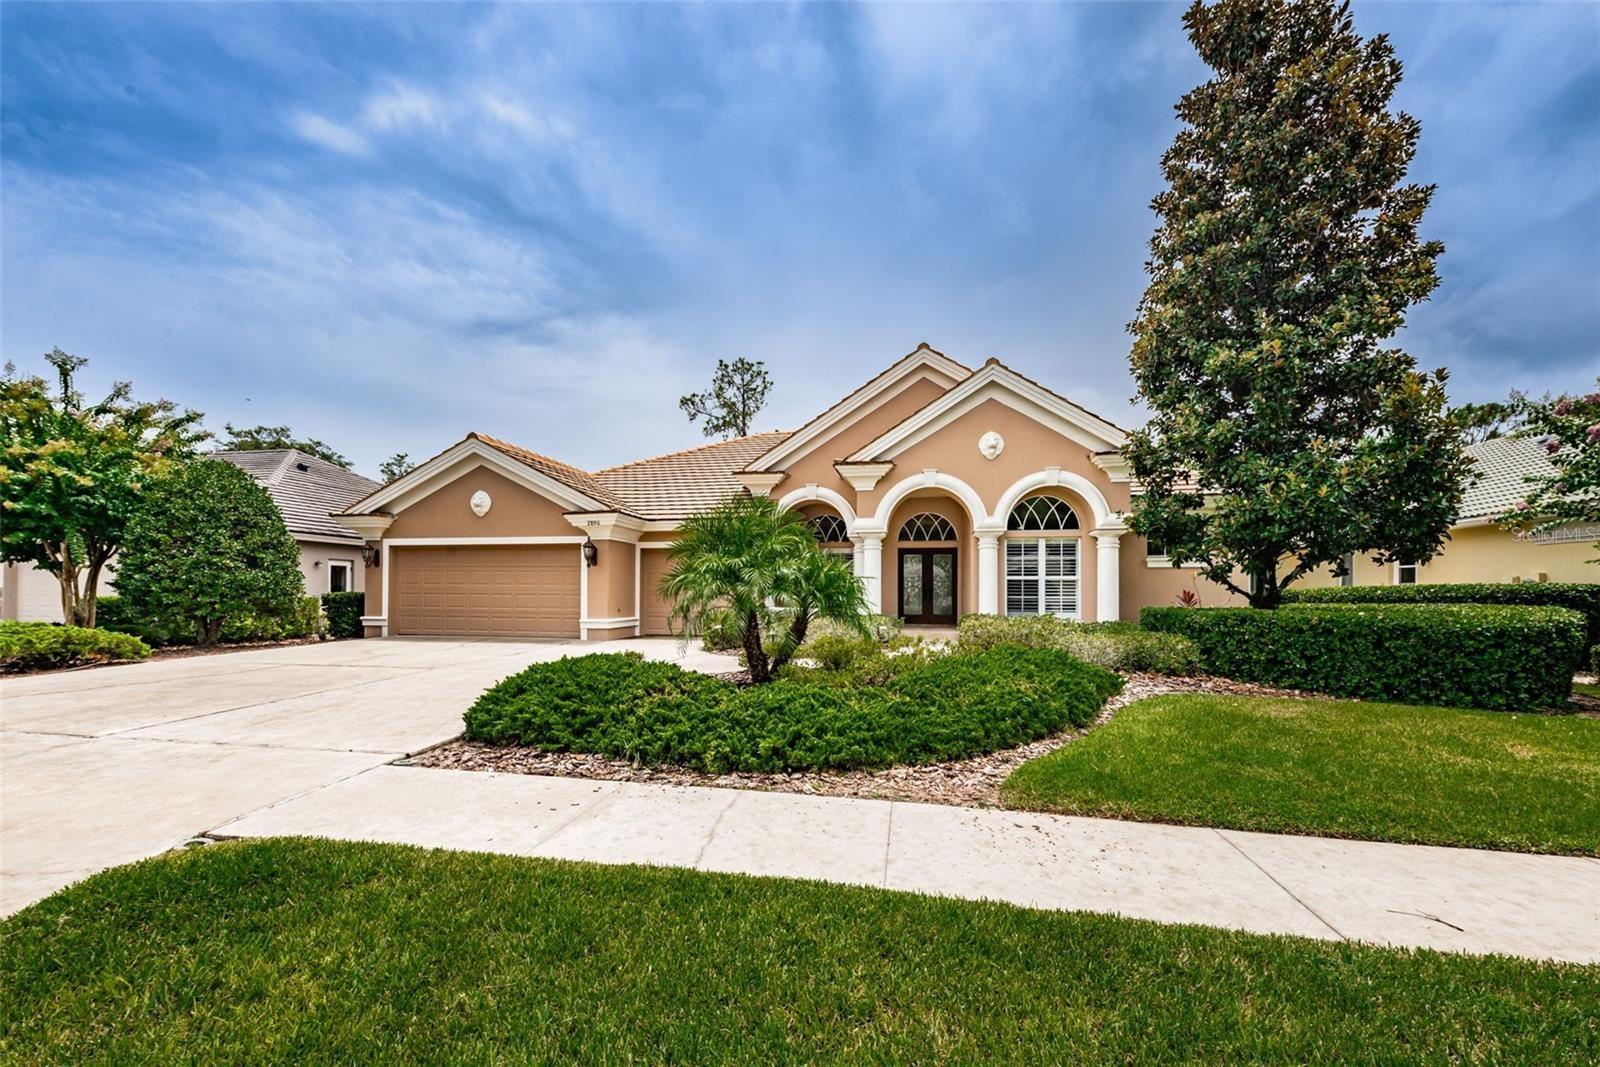 2890 GREY OAKS BOULEVARD, Tarpon Springs, FL 34688 - #: W7836359